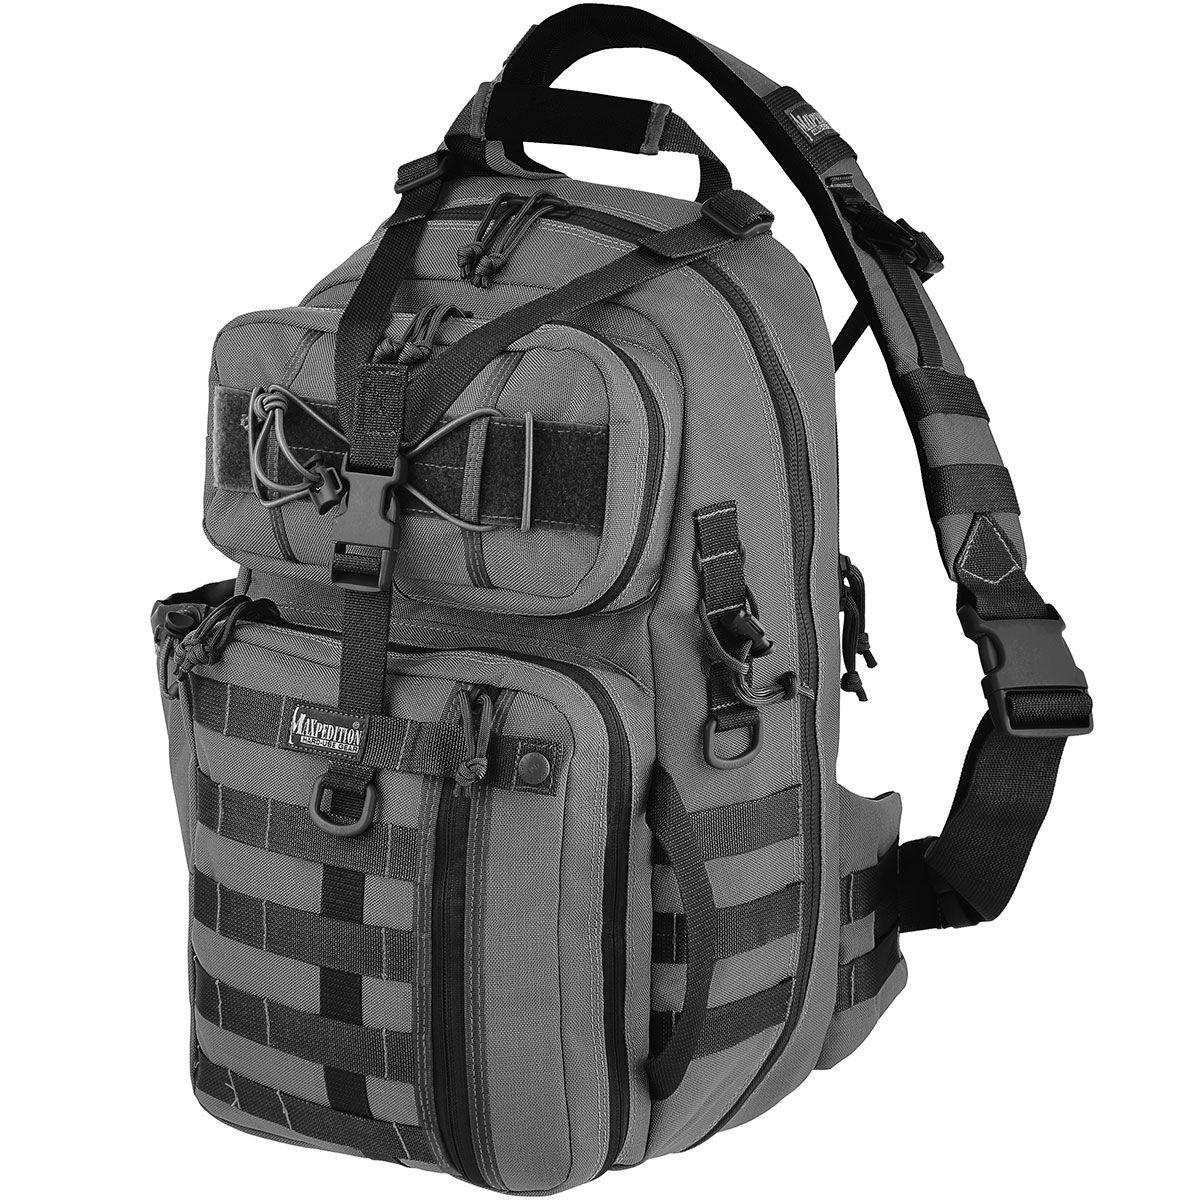 Maxpedition 0432W Kodiak Gearslinger Backpack, Wolf Gray